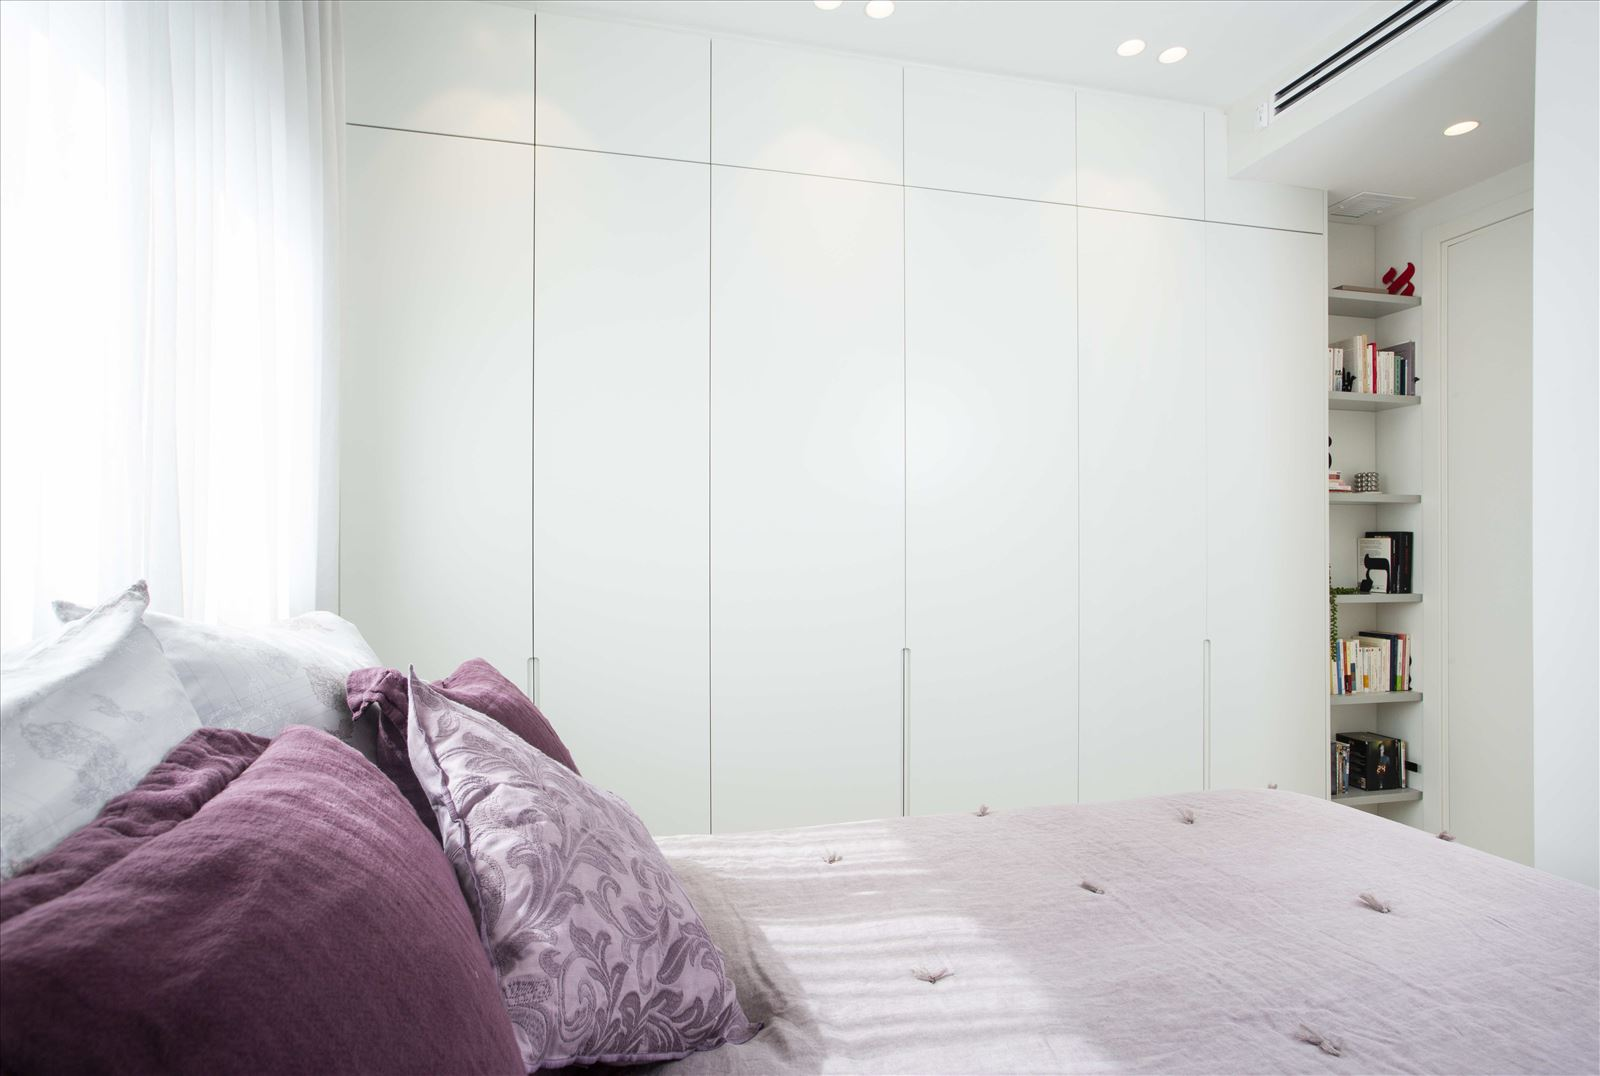 Tel Aviv apartment in Parisian aroma תאורה בחדר שינה על ידי קמחי תאורה